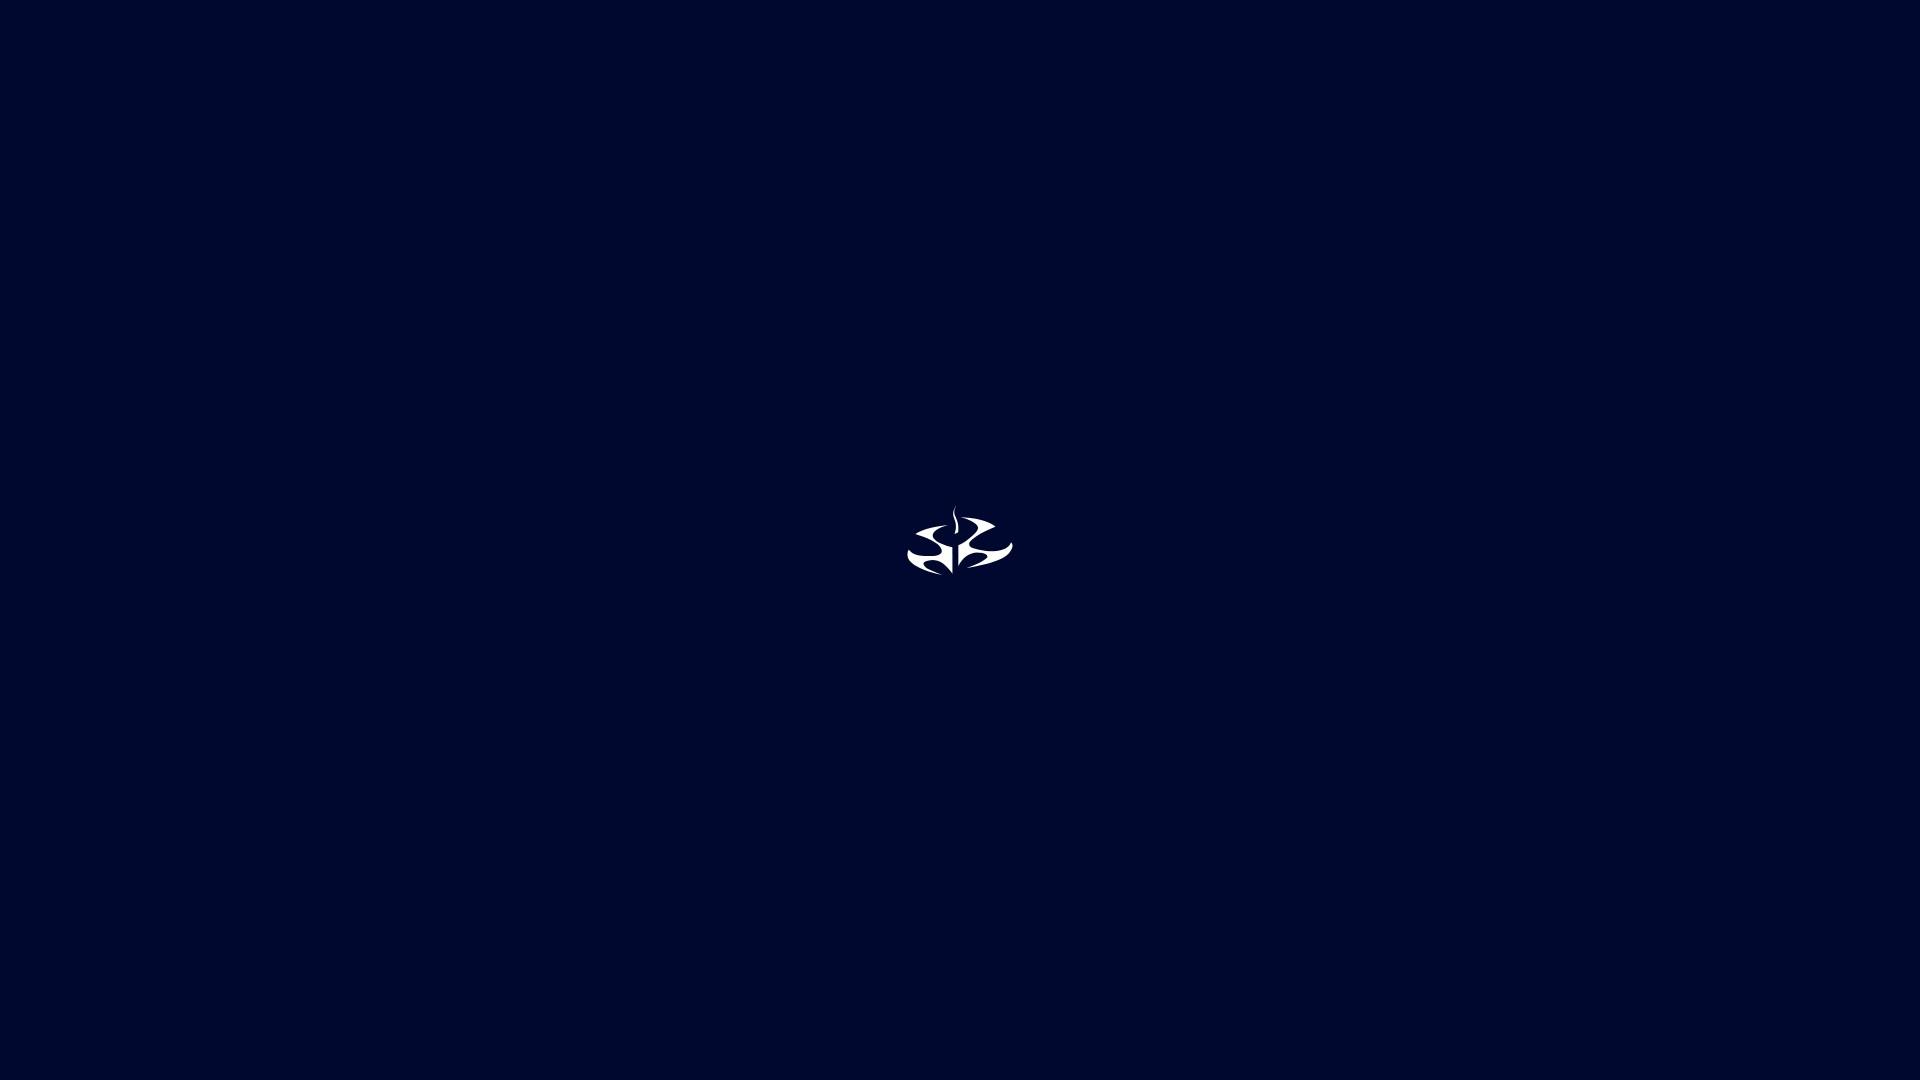 1920x1080 px Hitman logo minimalism